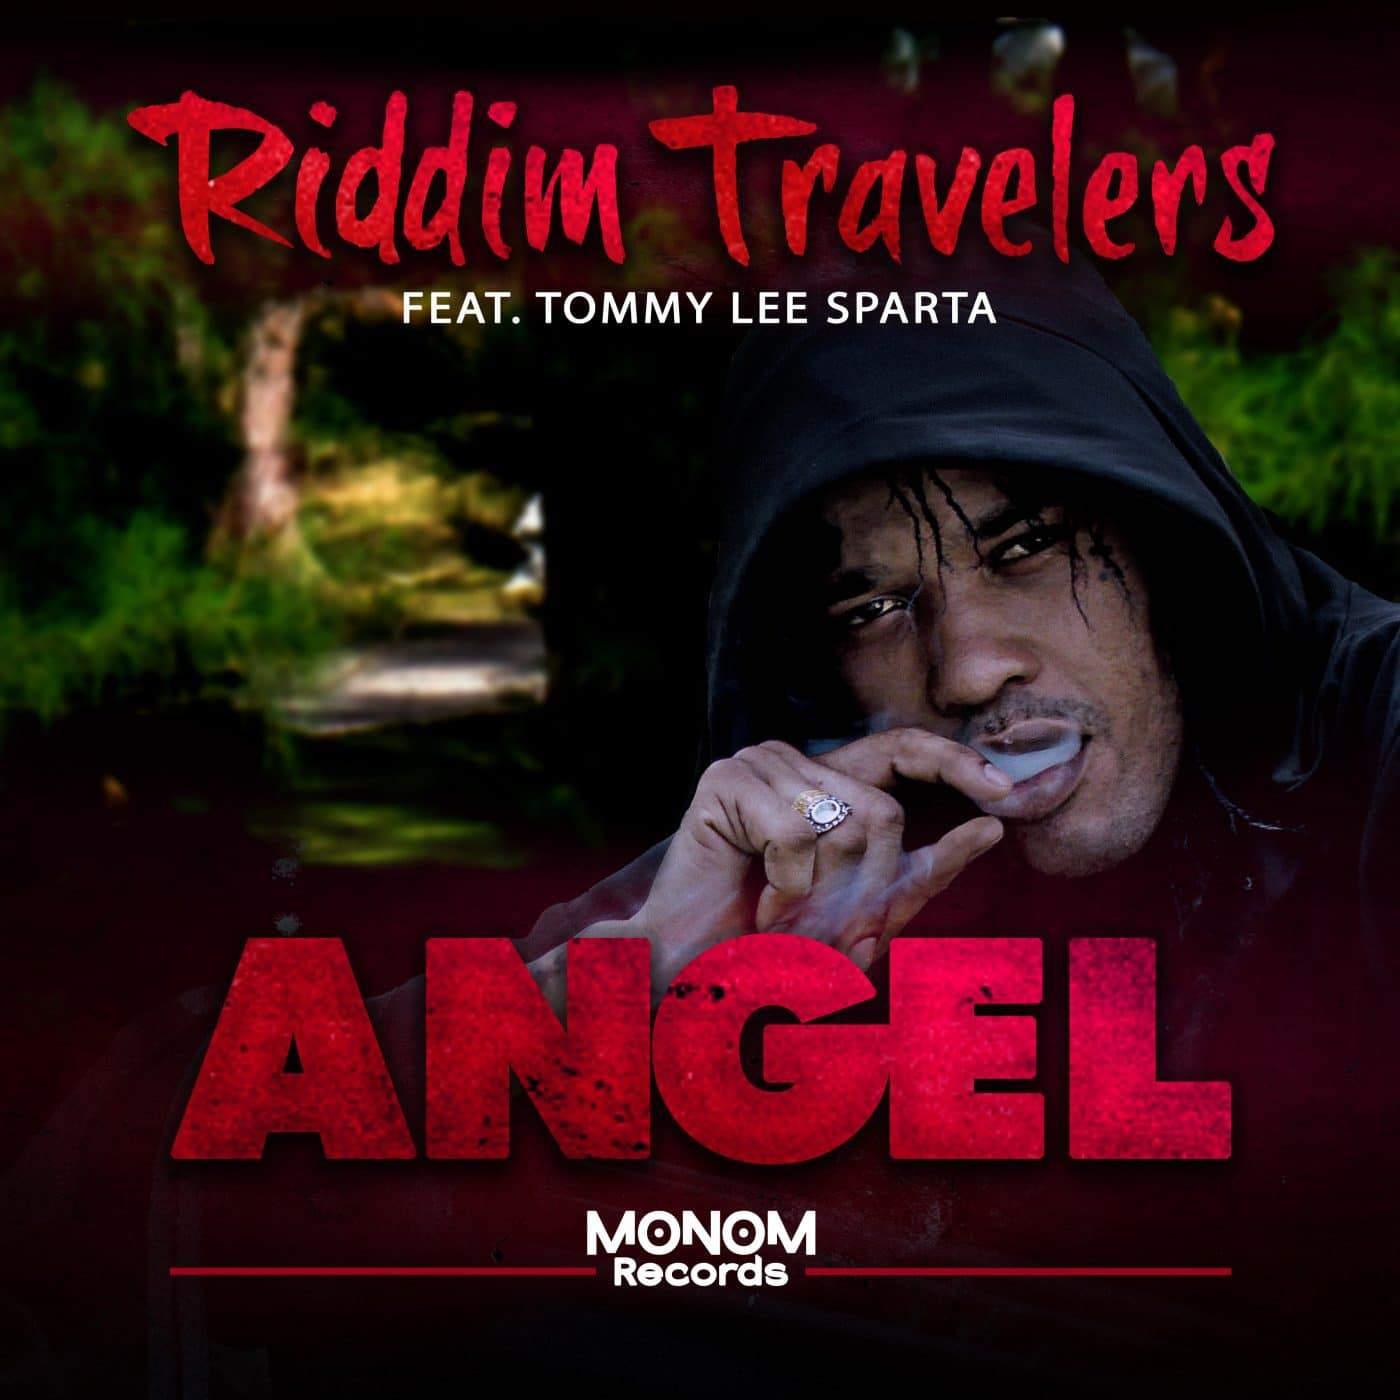 Riddim Travelers feat. Tommy Lee Sparta - Angel (Dancehall Mix) - Monom Recrods